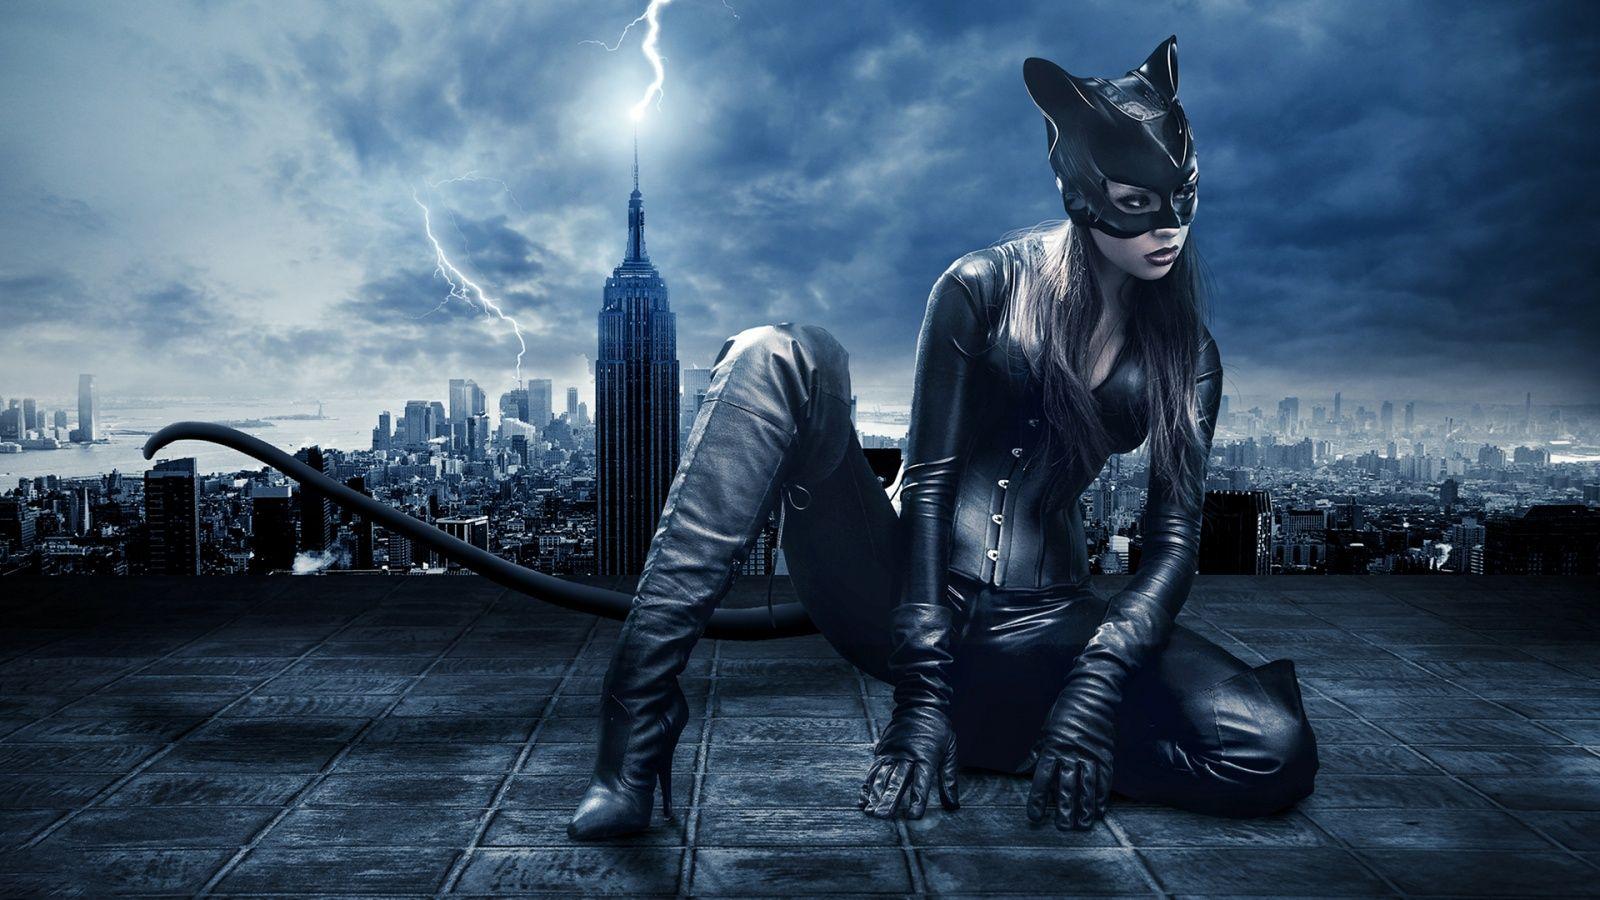 catwoman hd wallpapers im catwoman hear me roar